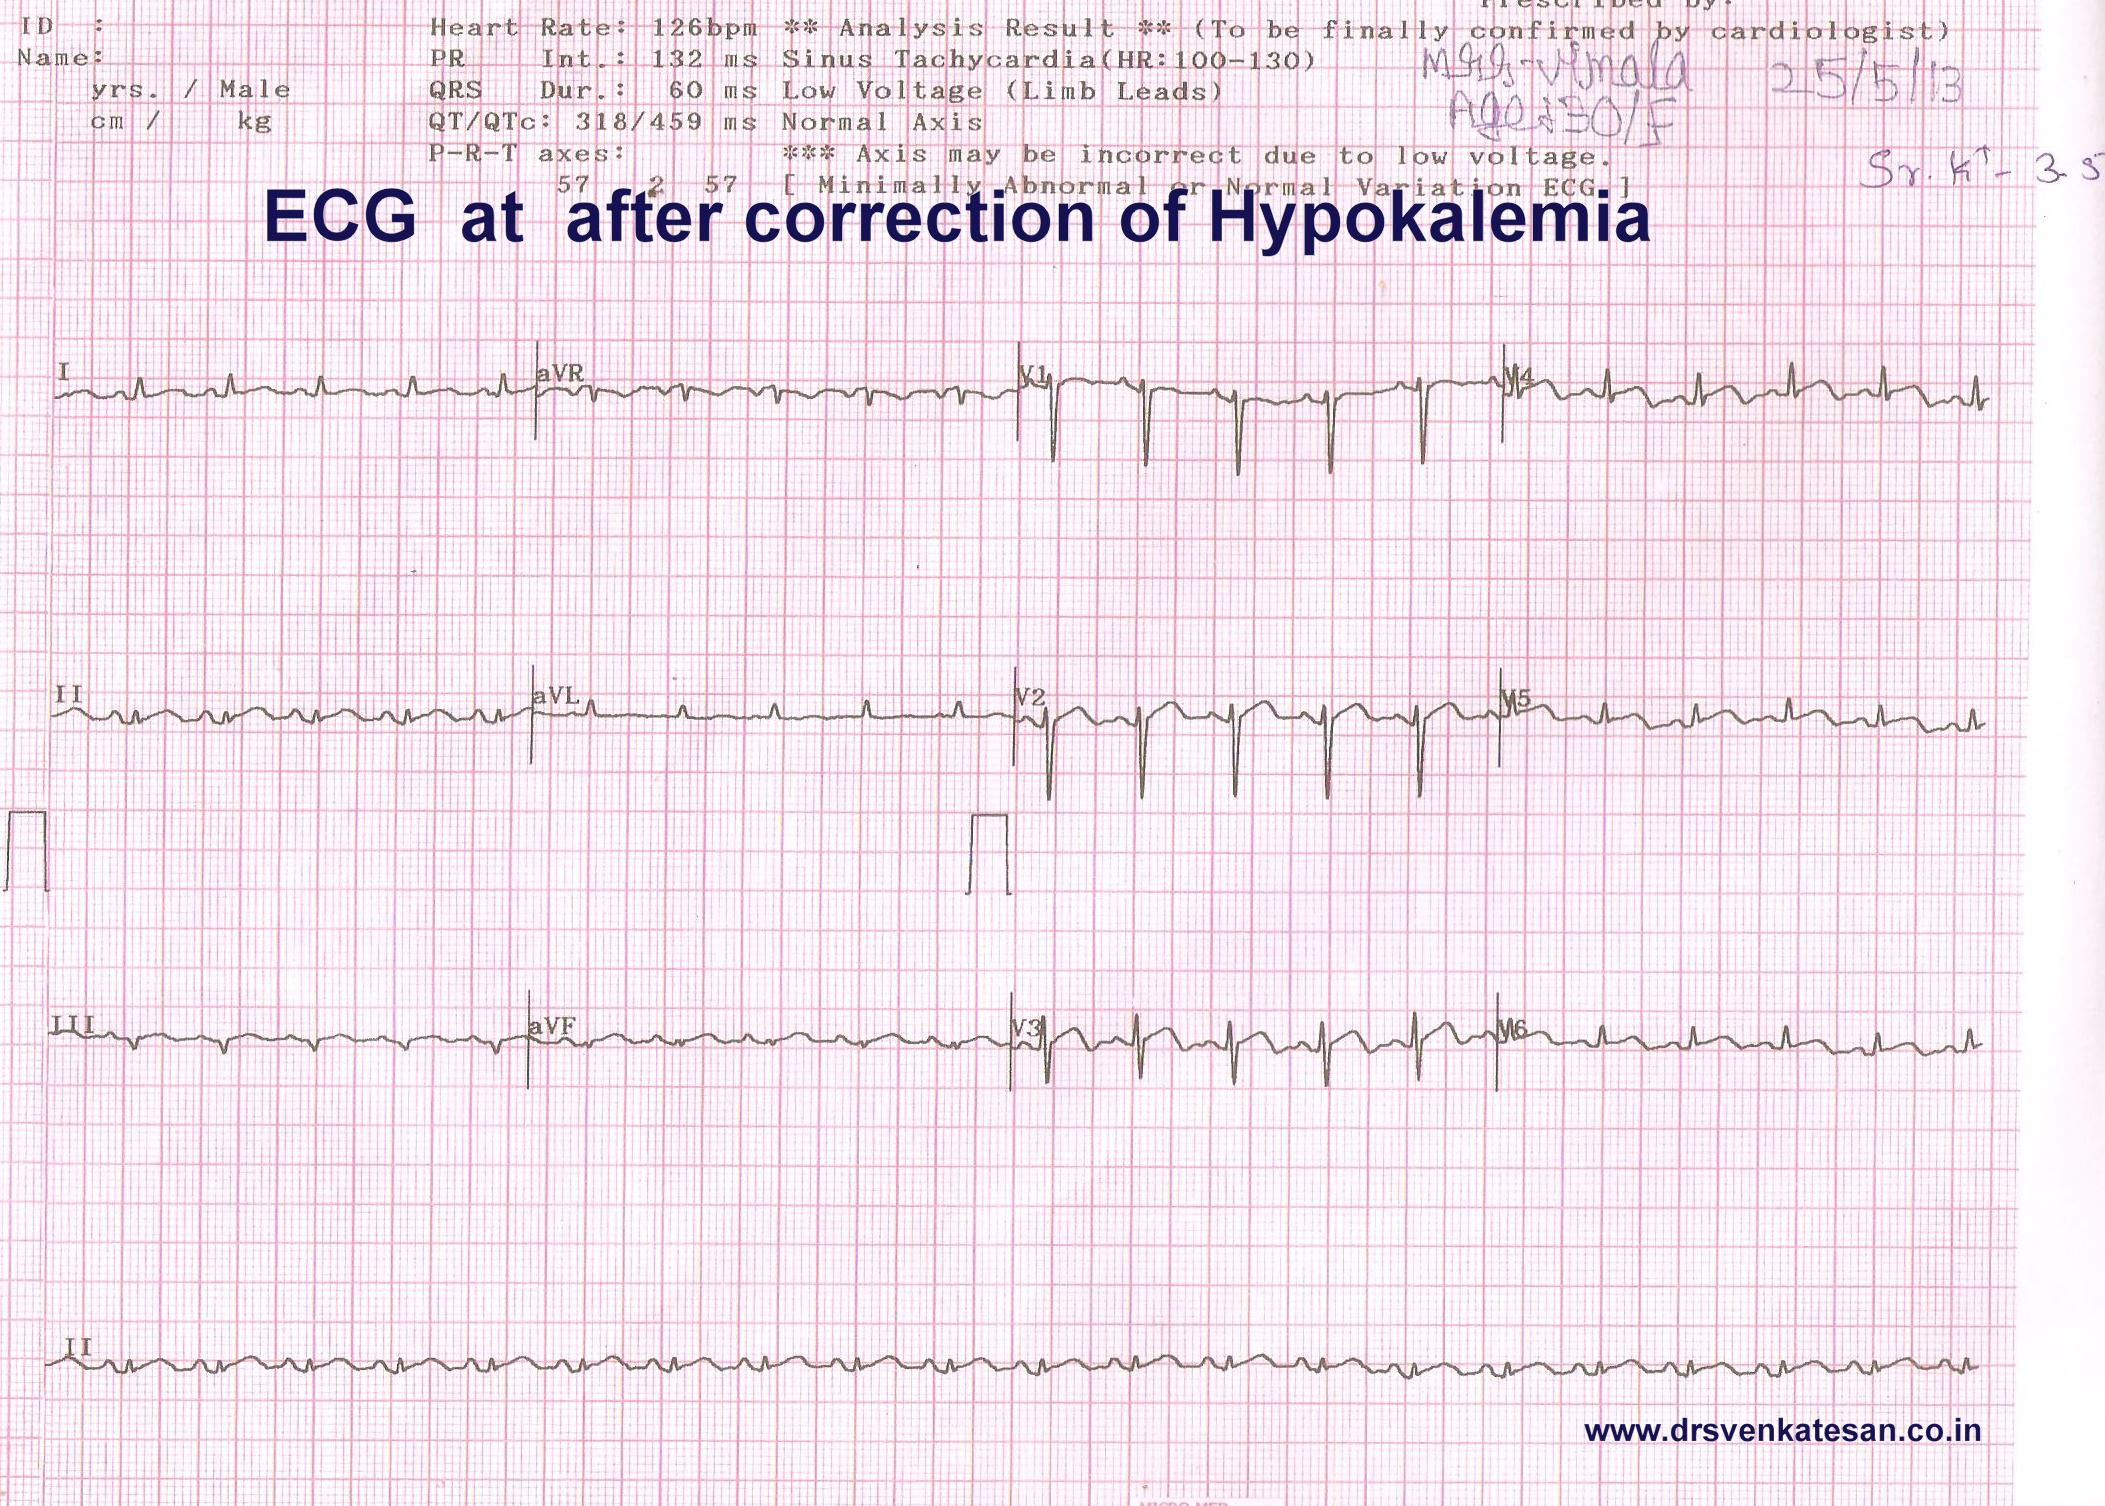 effect of hypokalemia on ecg | Dr.S.Venkatesan MD